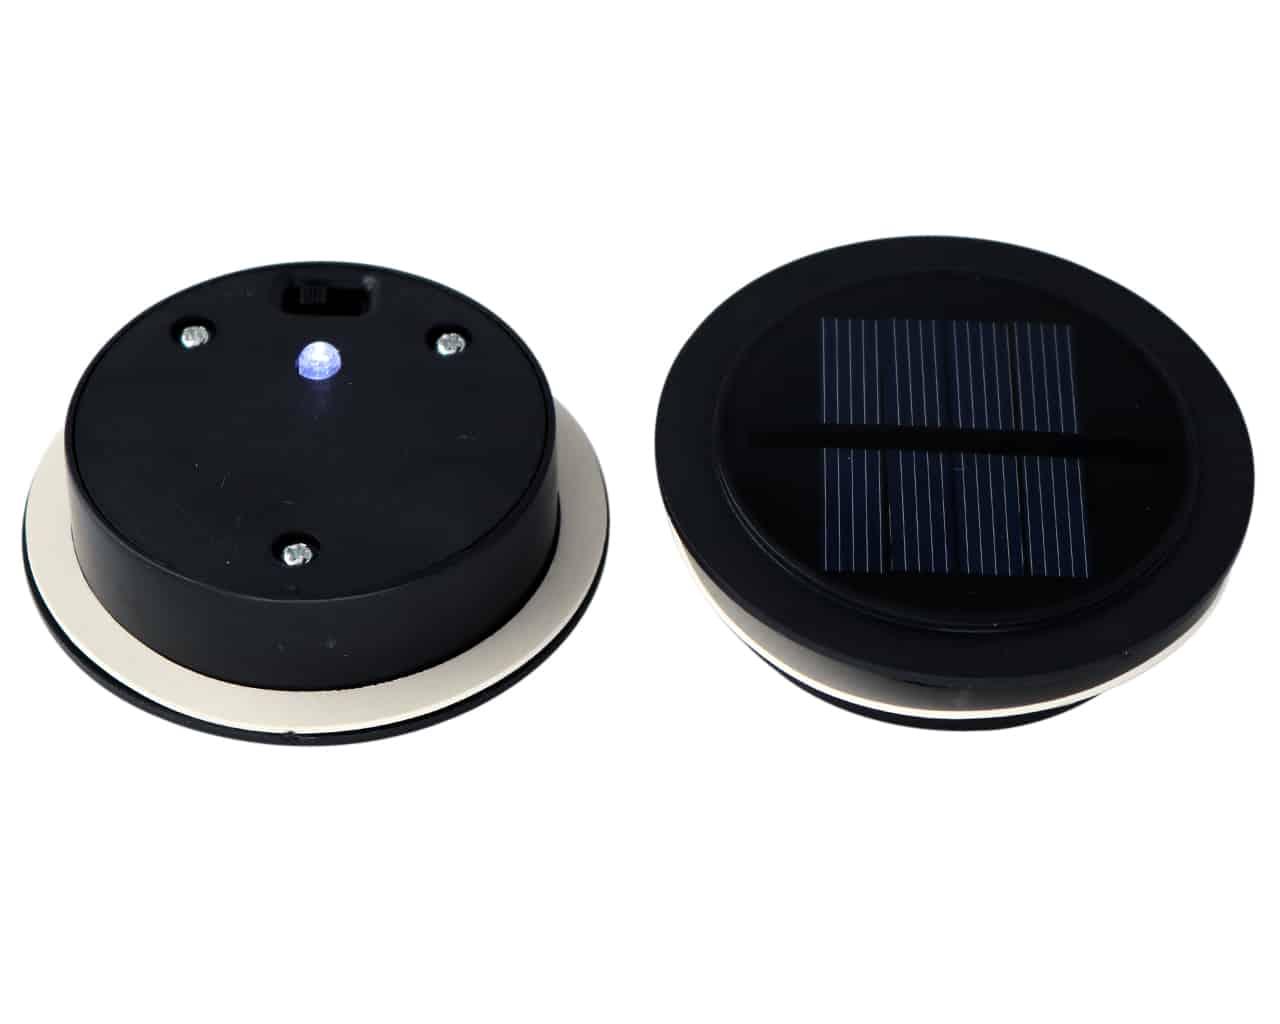 Solar Led Light Lids With Bright Single Bulb